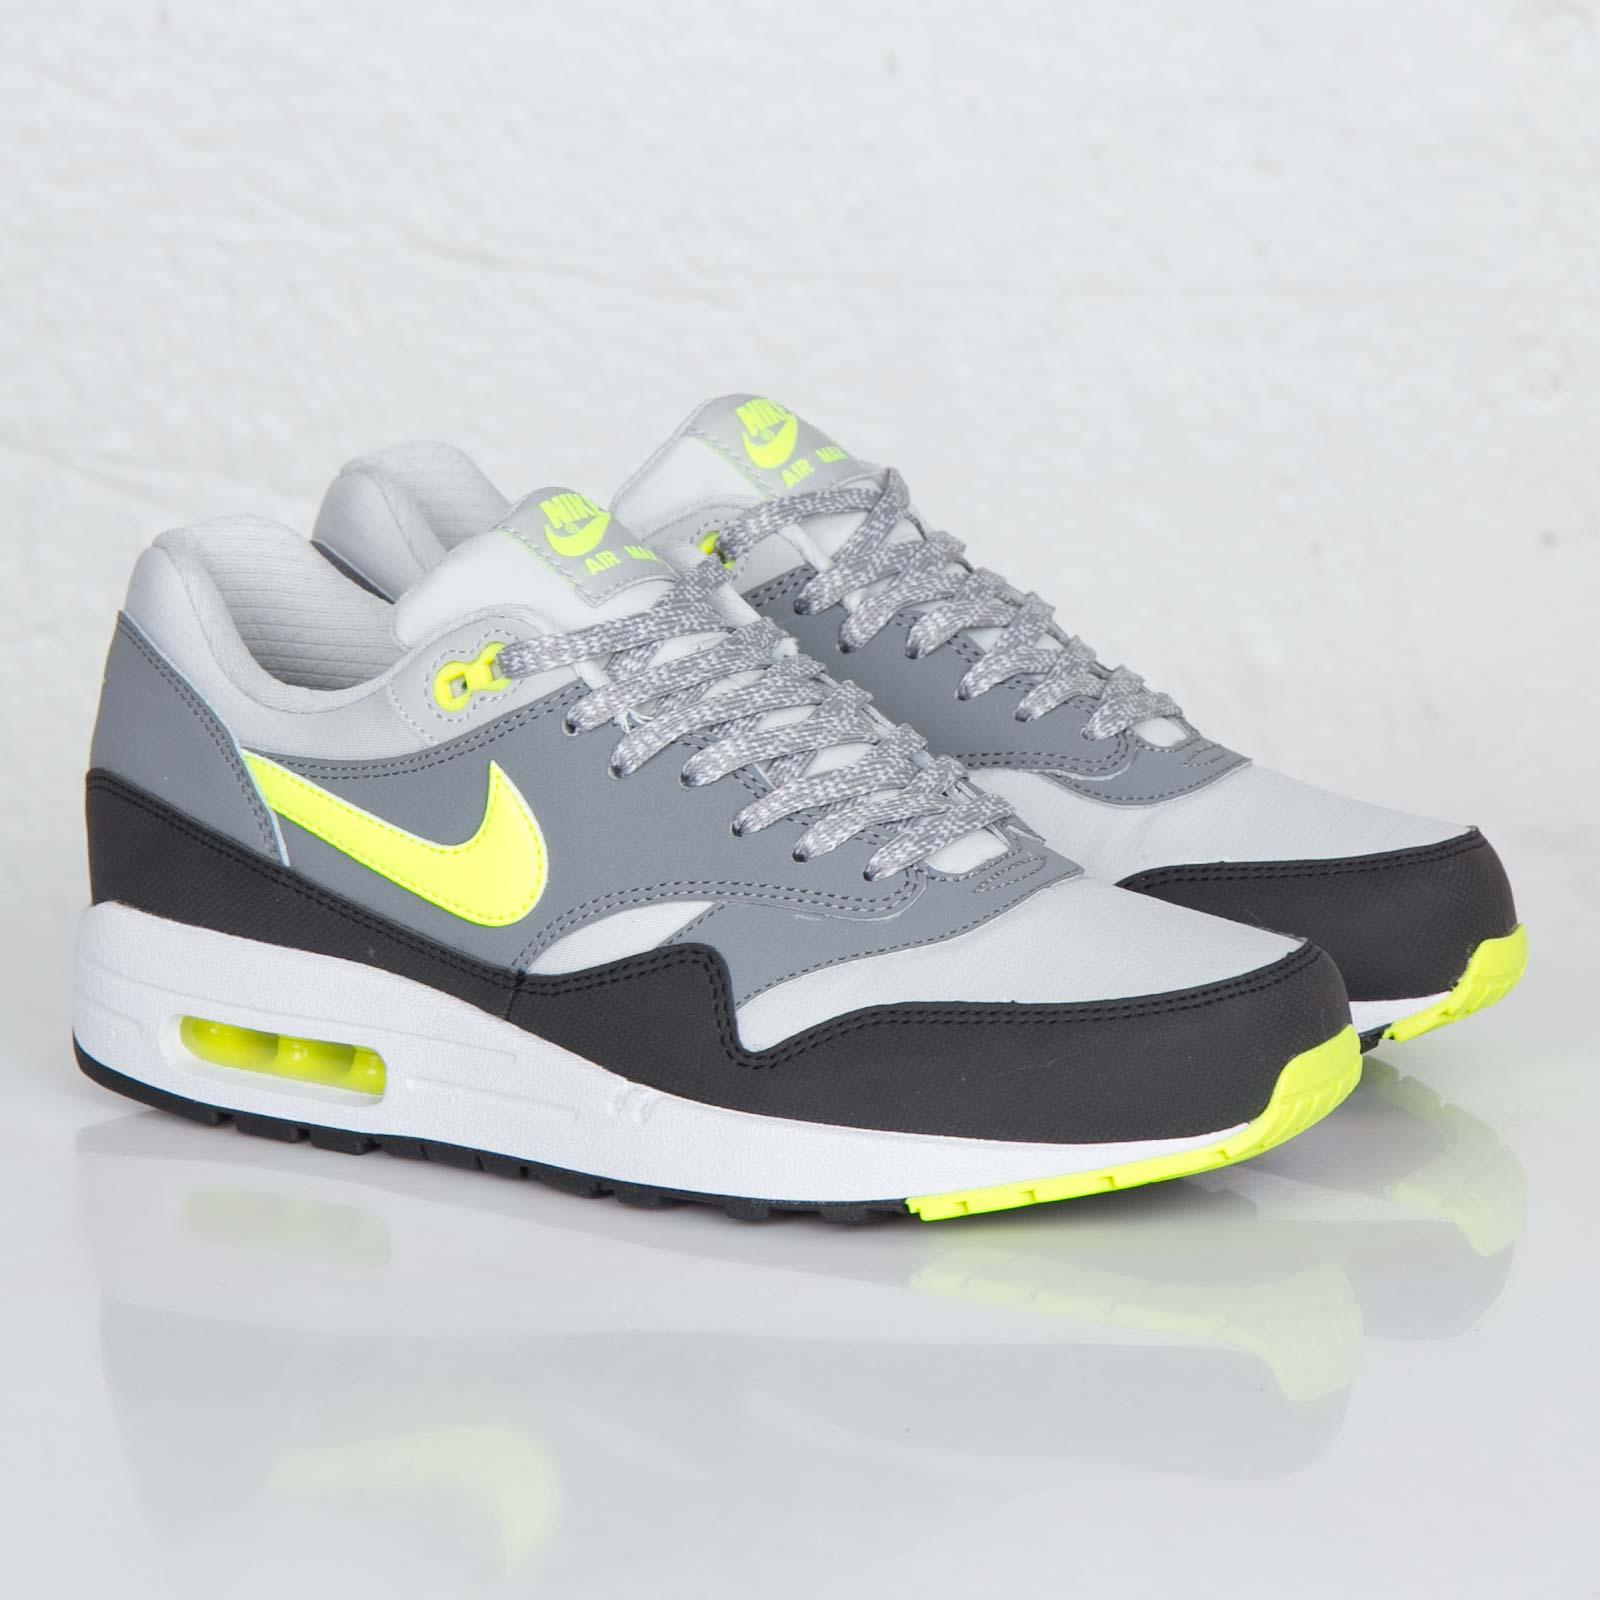 87fe292a1ca0 Nike Air Max 1 Essential - 537383-070 - Sneakersnstuff